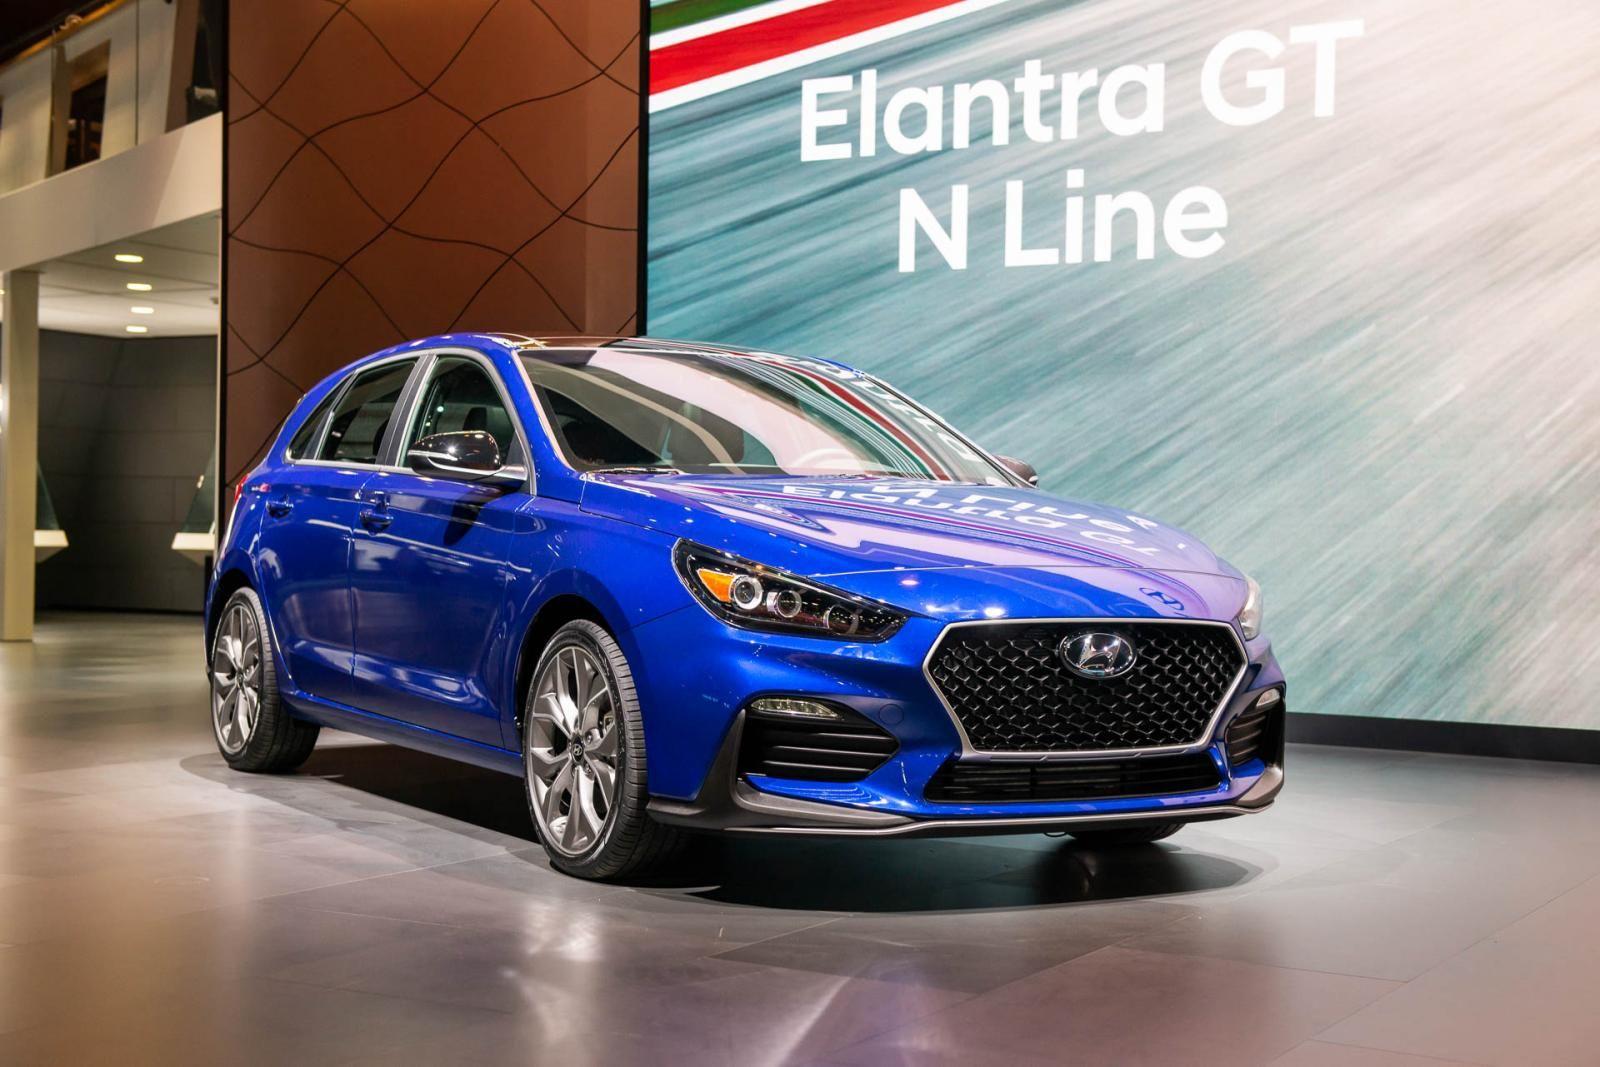 2020 hyundai elantra - design, engine performance and